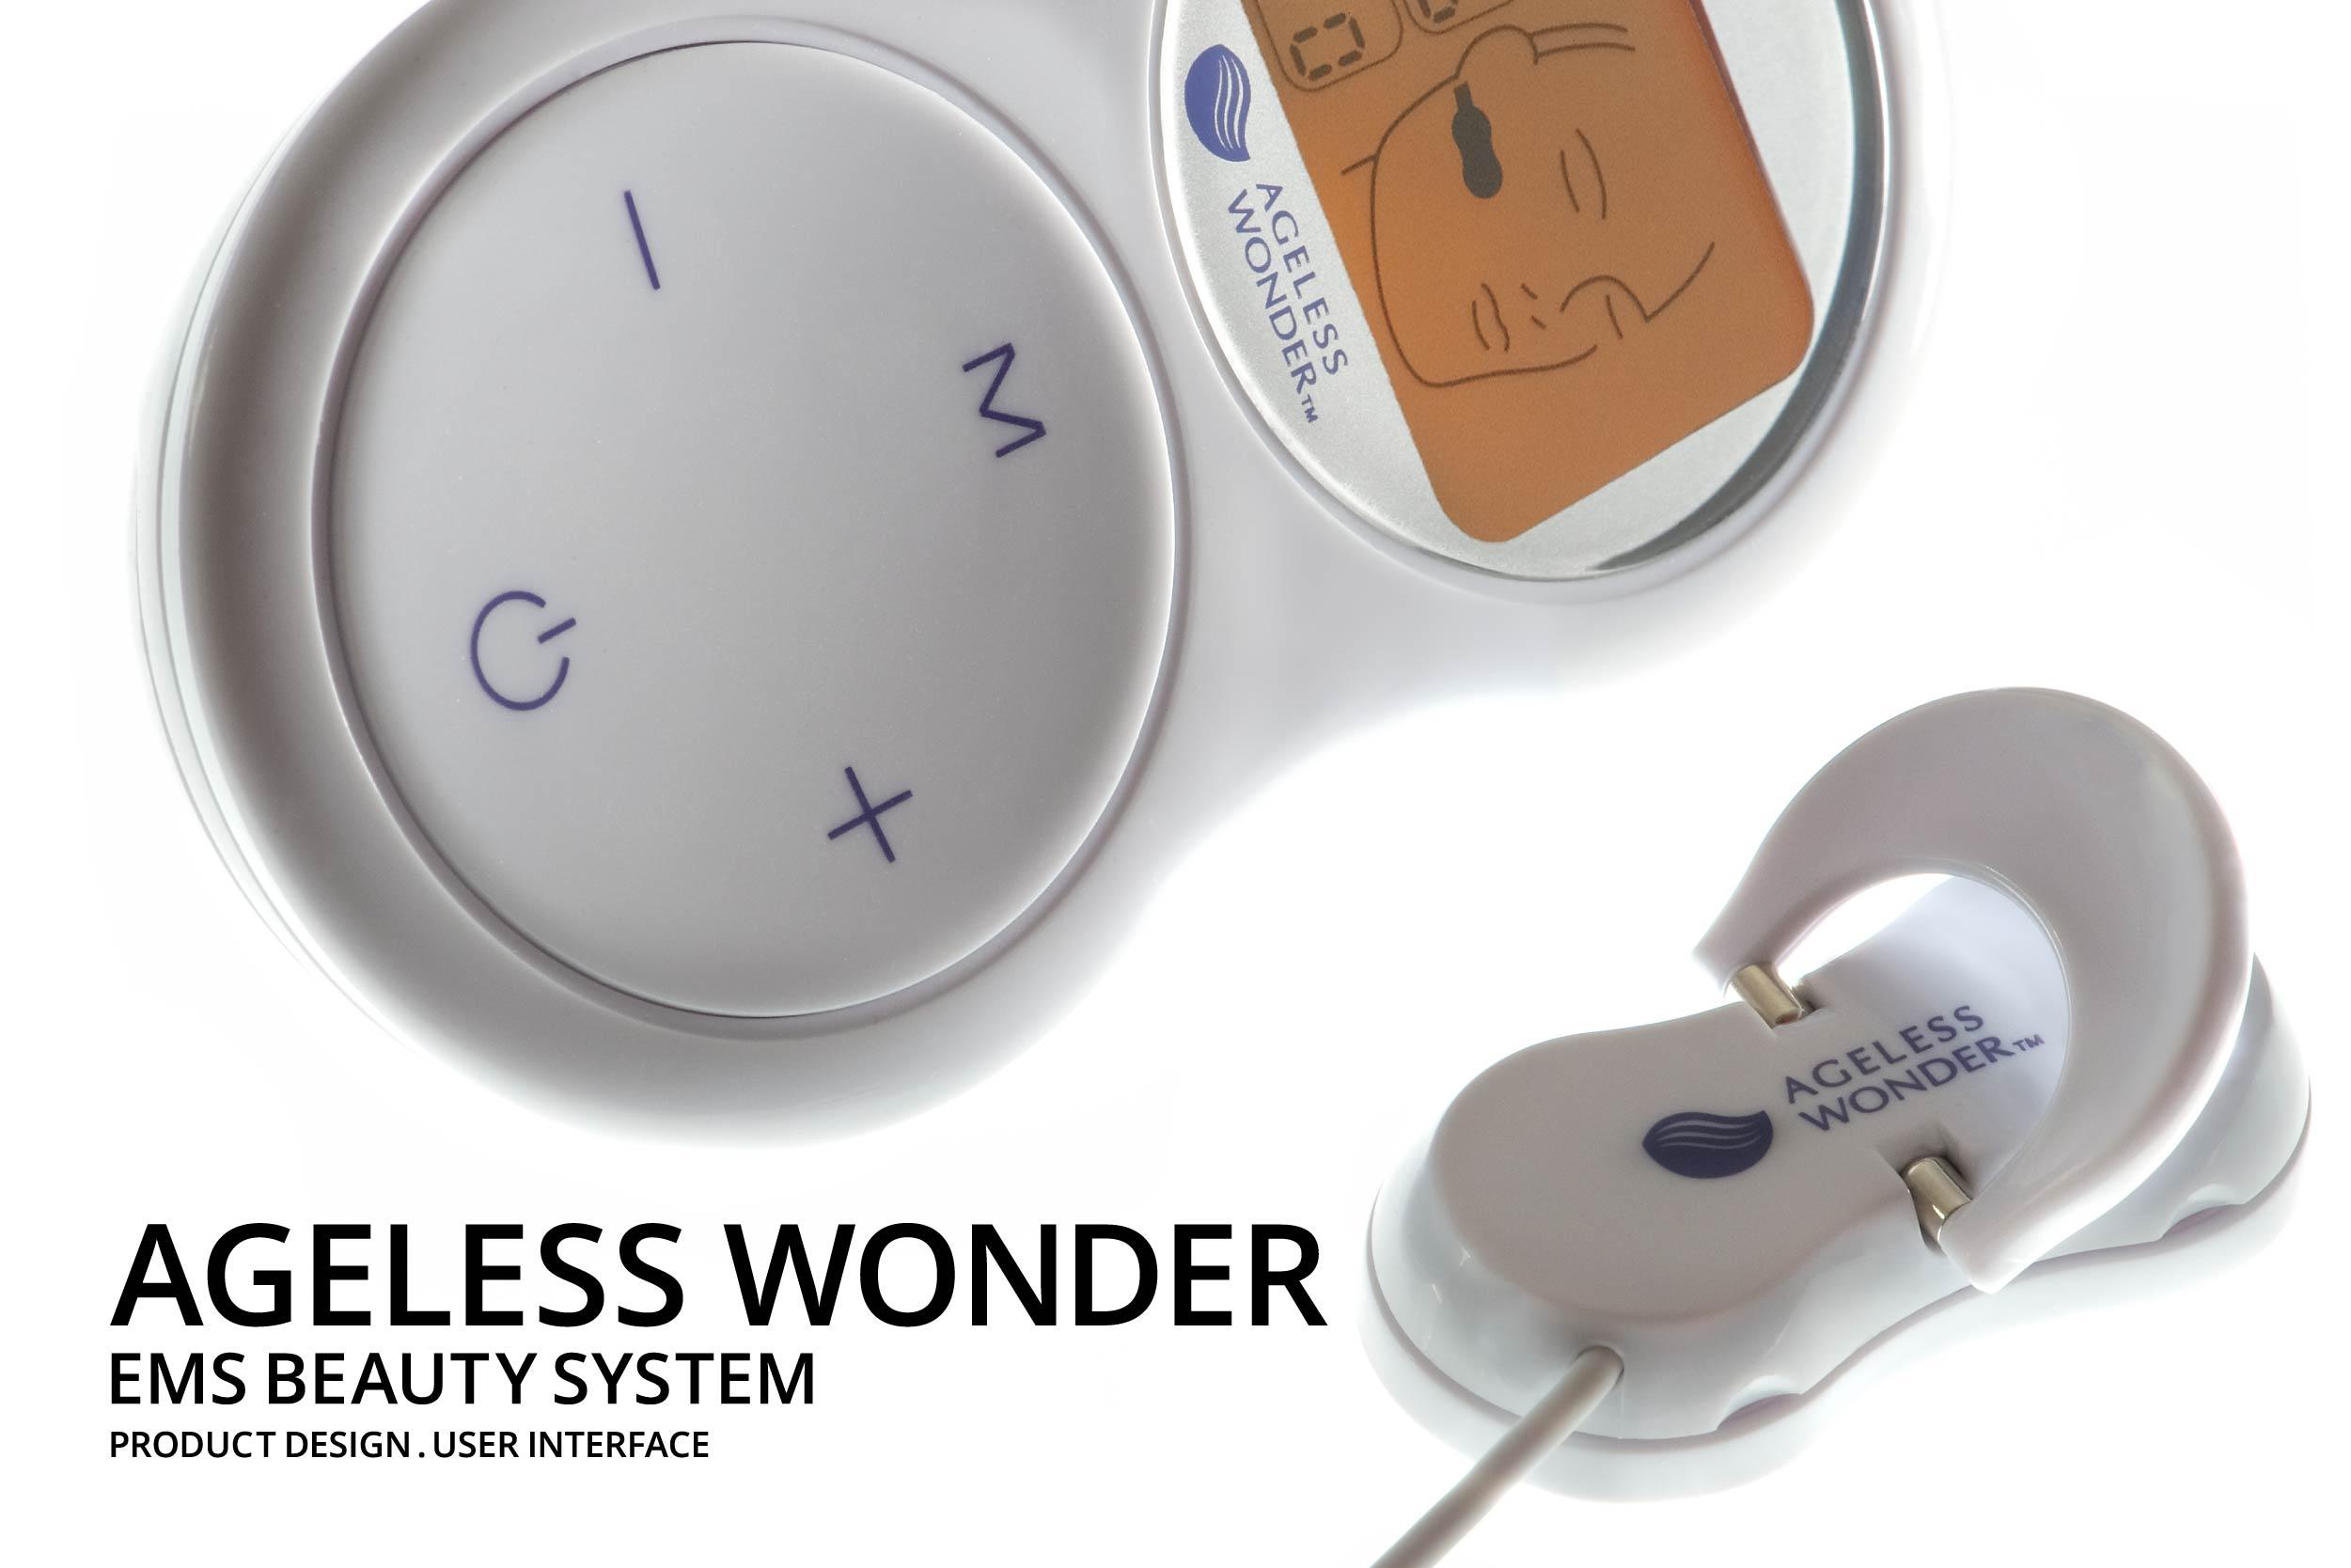 AGELESS-WONDER-1